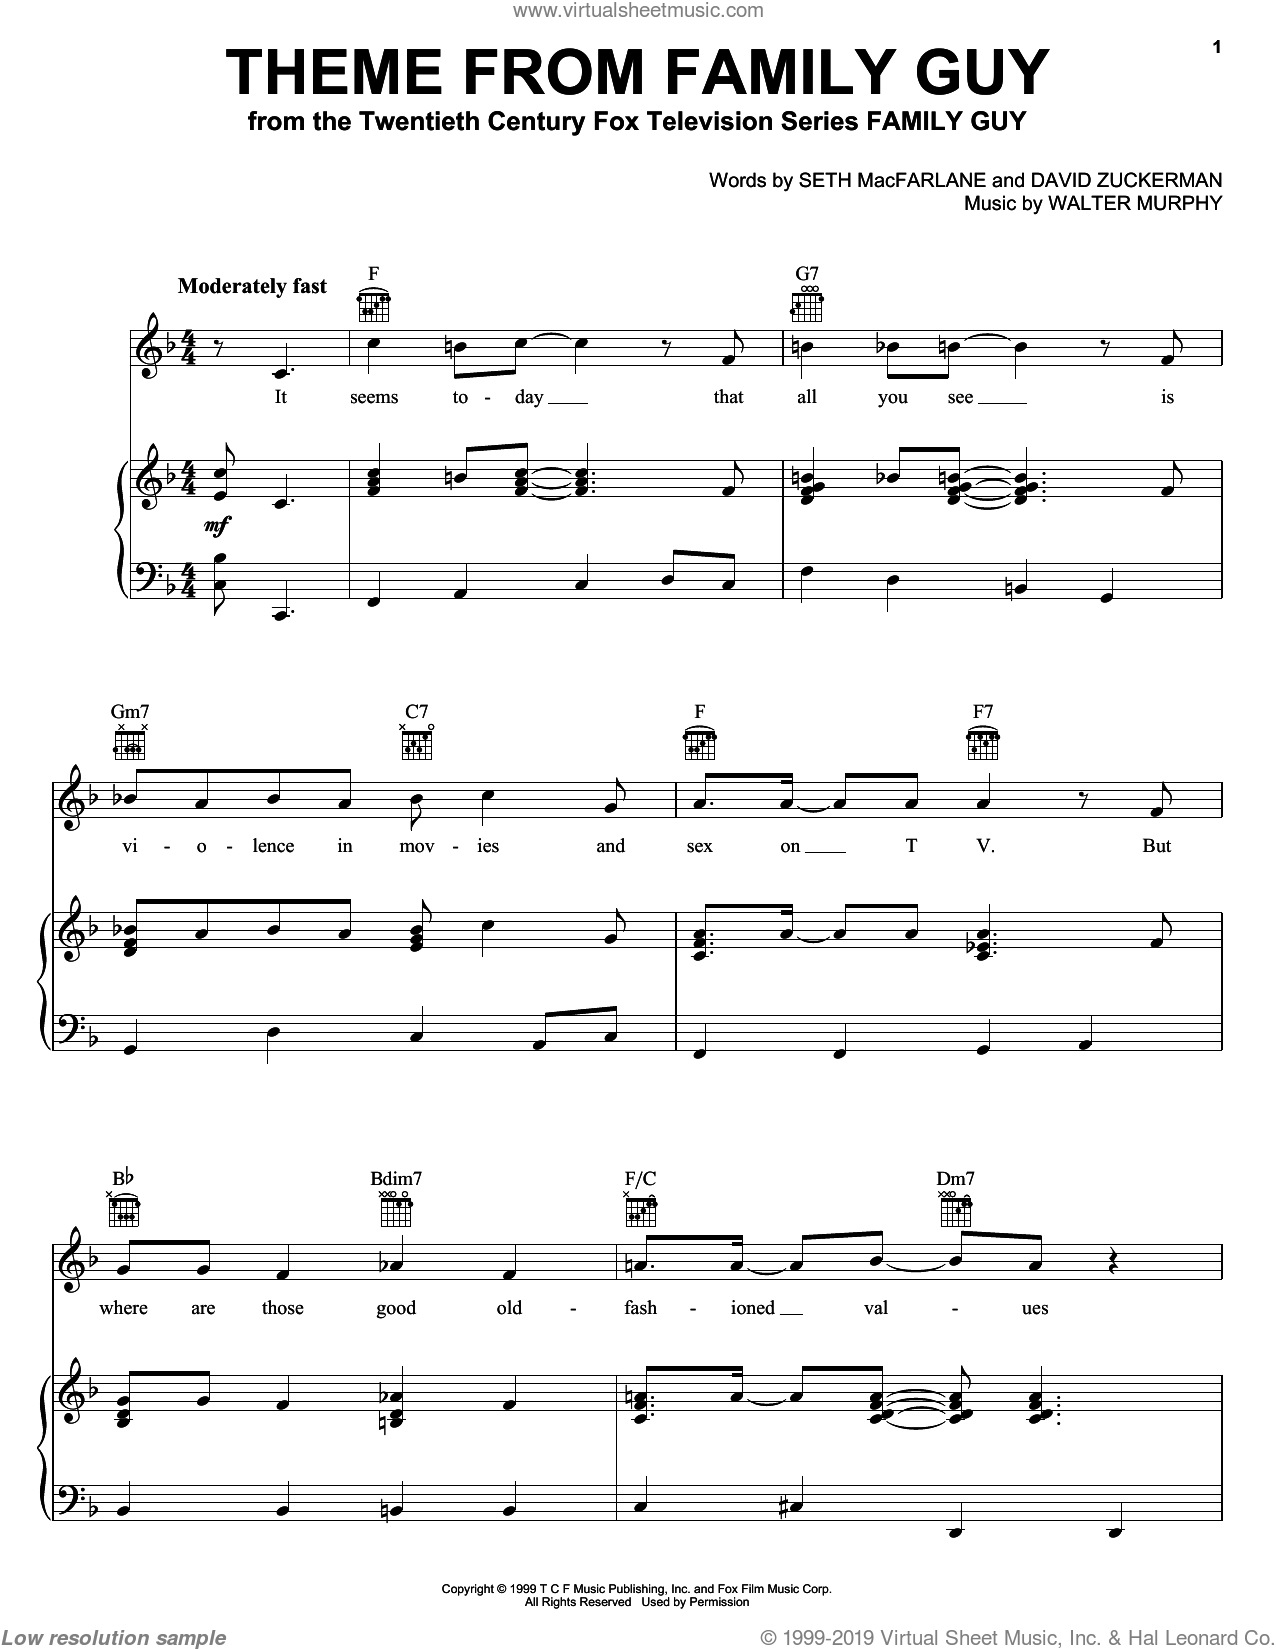 Theme From Family Guy sheet music for voice, piano or guitar by Seth MacFarlane, David Zuckerman and Walter Murphy, intermediate skill level